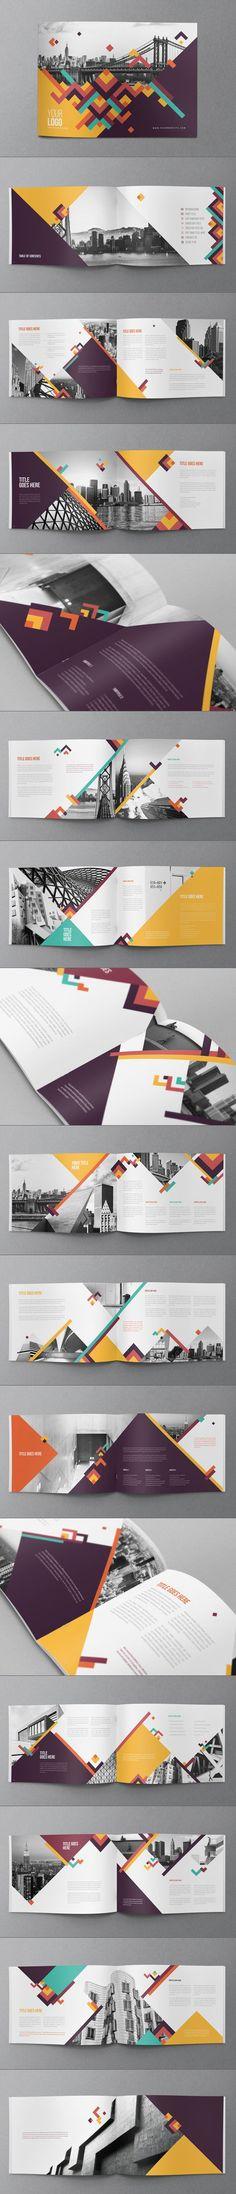 Colorful Pattern Brochure by Abra Design, via Behance: